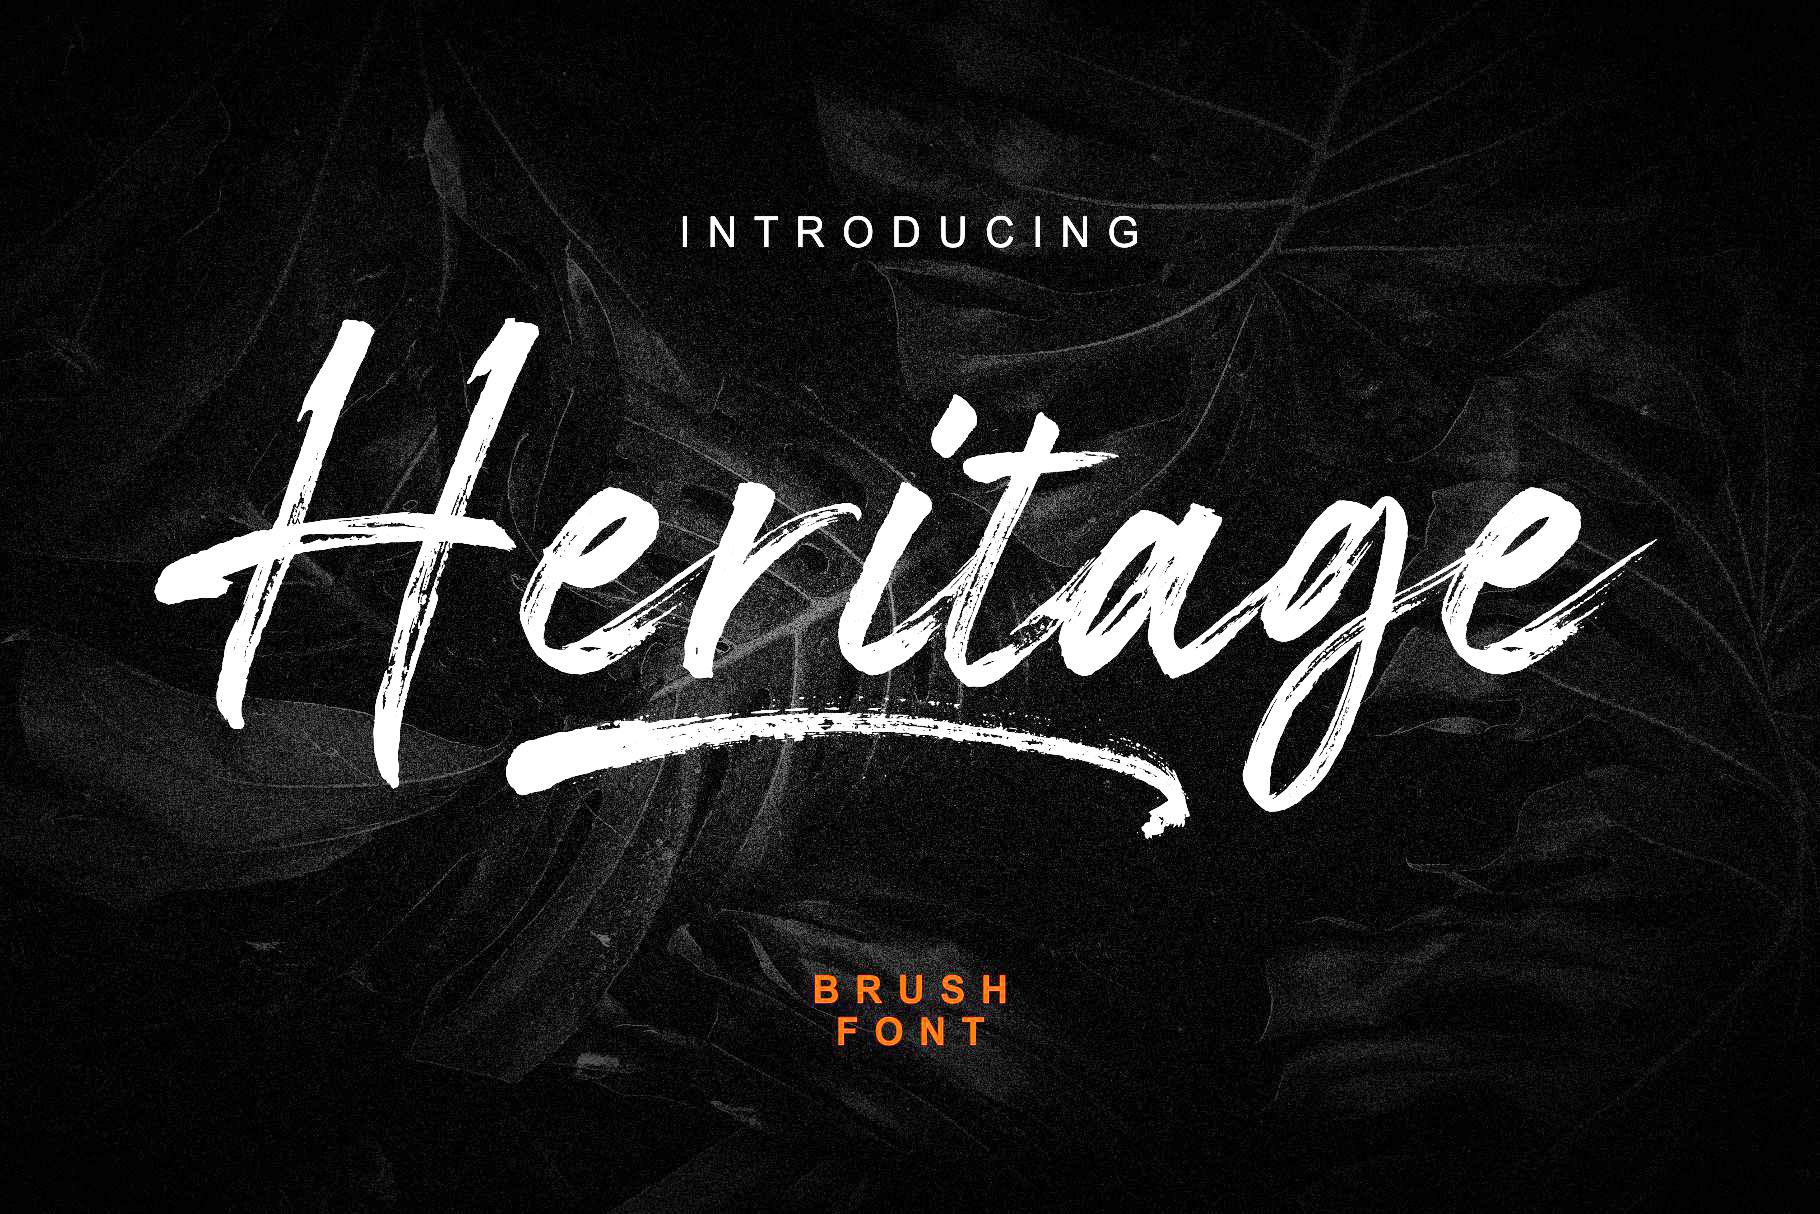 Heritage Brush Script Font